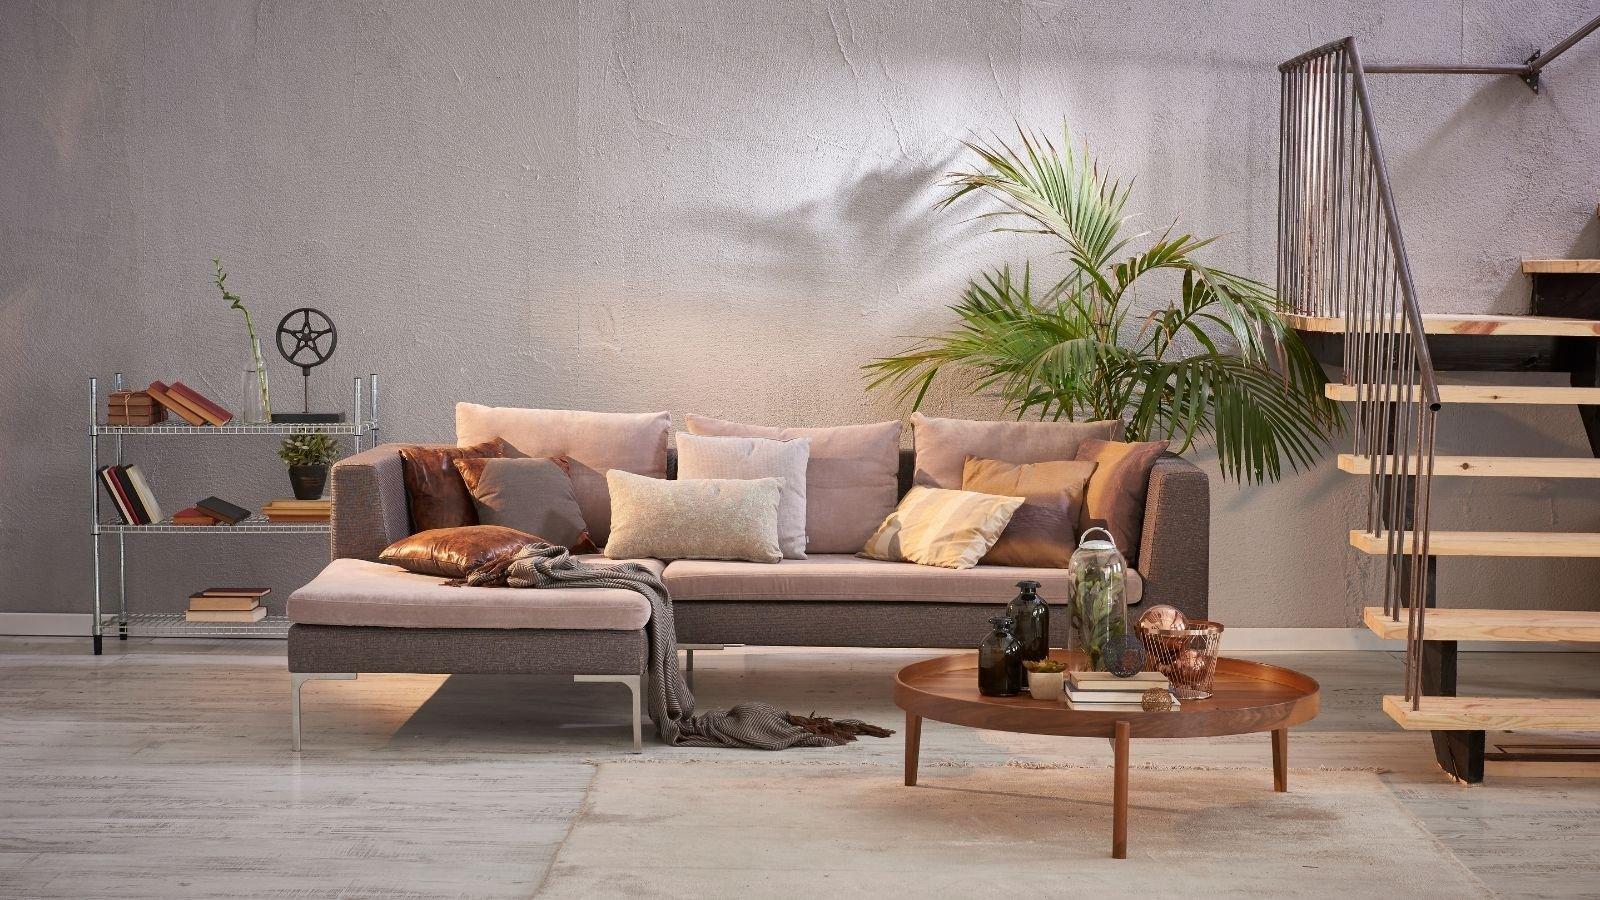 32 Nature Inspired Living Room Decor Ideas